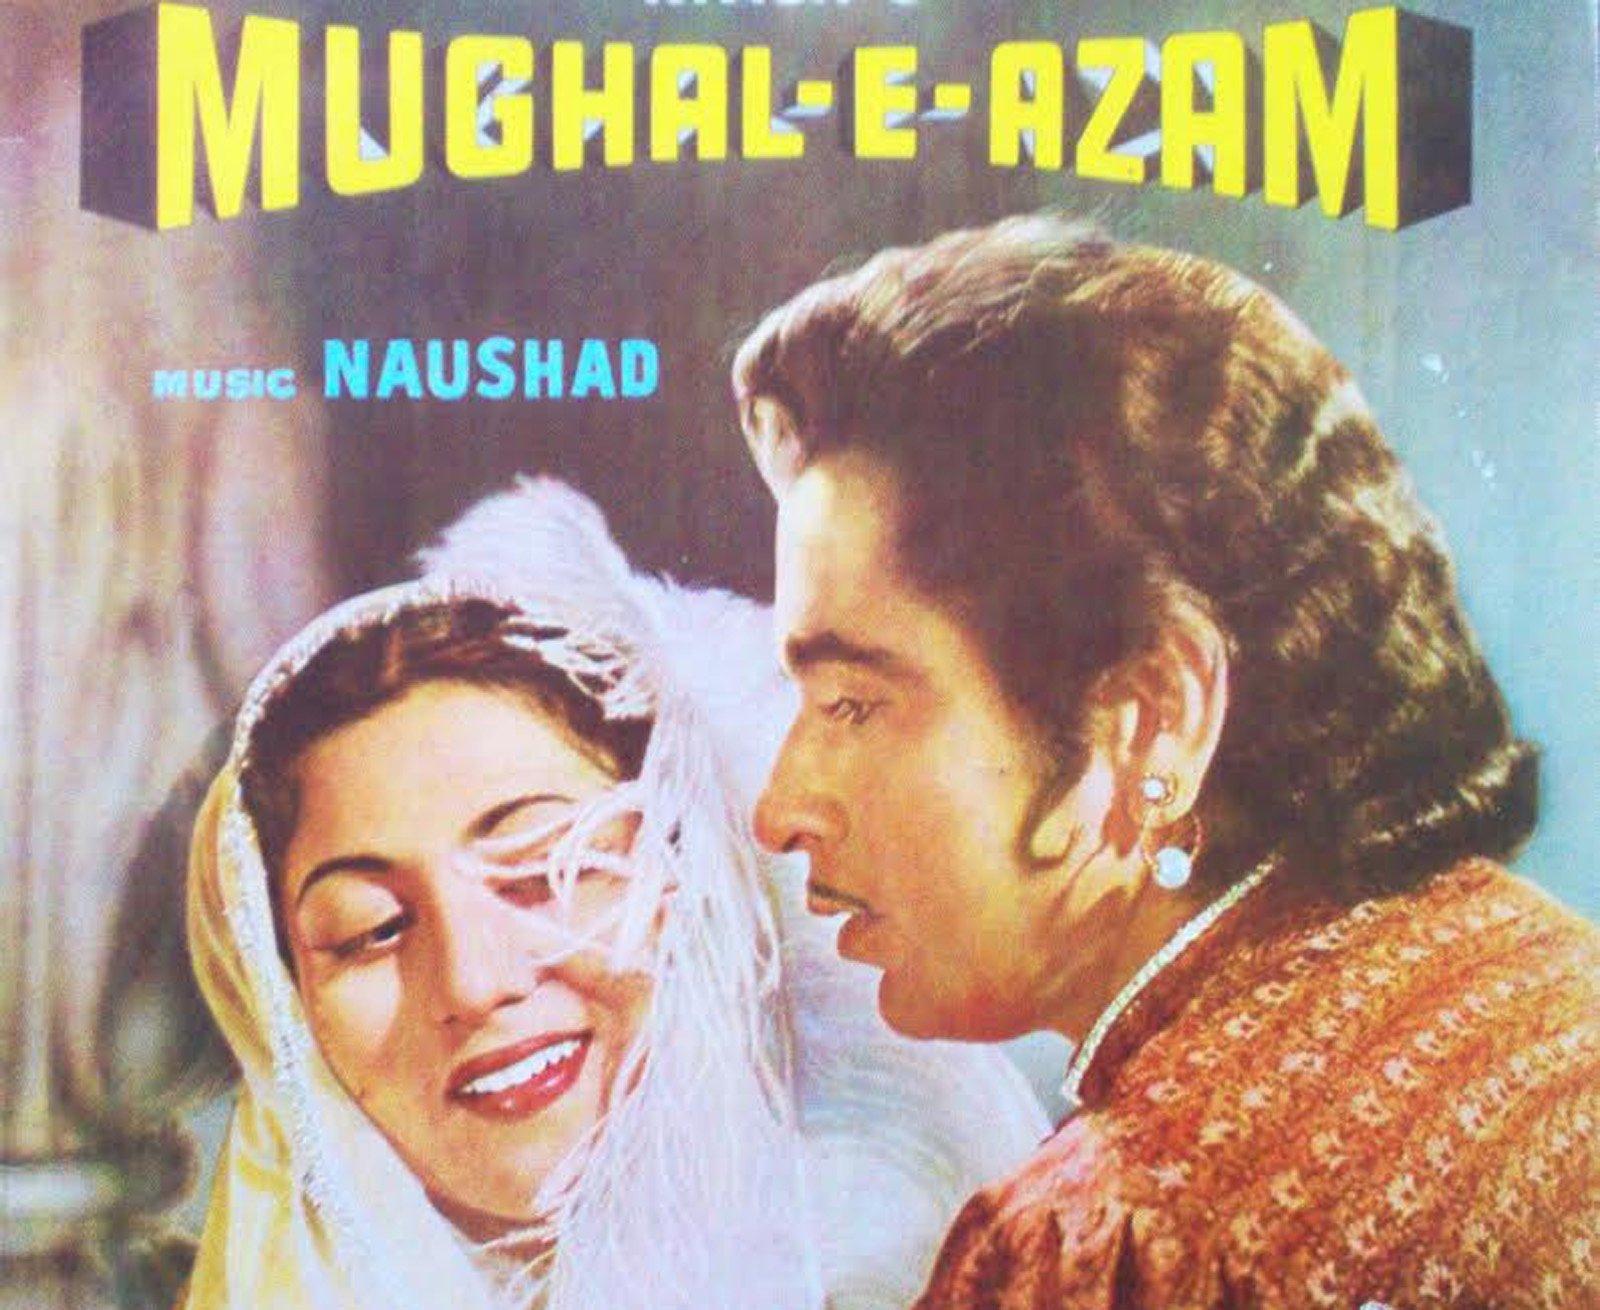 Hindi movie mughal e azam online dating